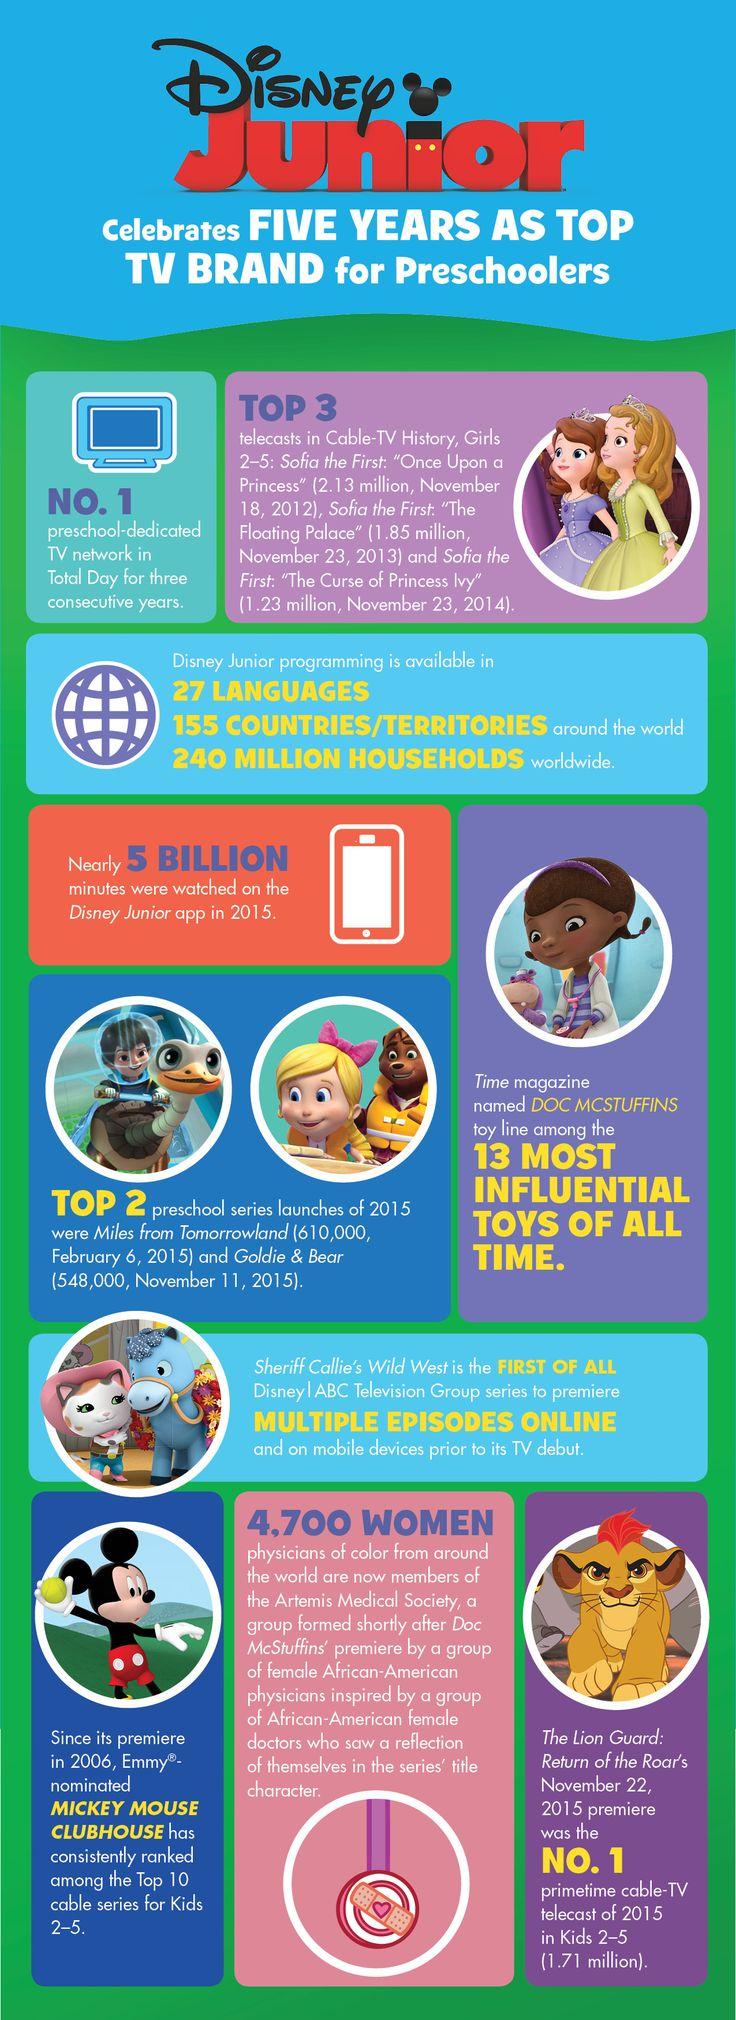 Disney Junior Celebrates Five Years as Top TV Brand for Preschoolers – The Walt Disney Company